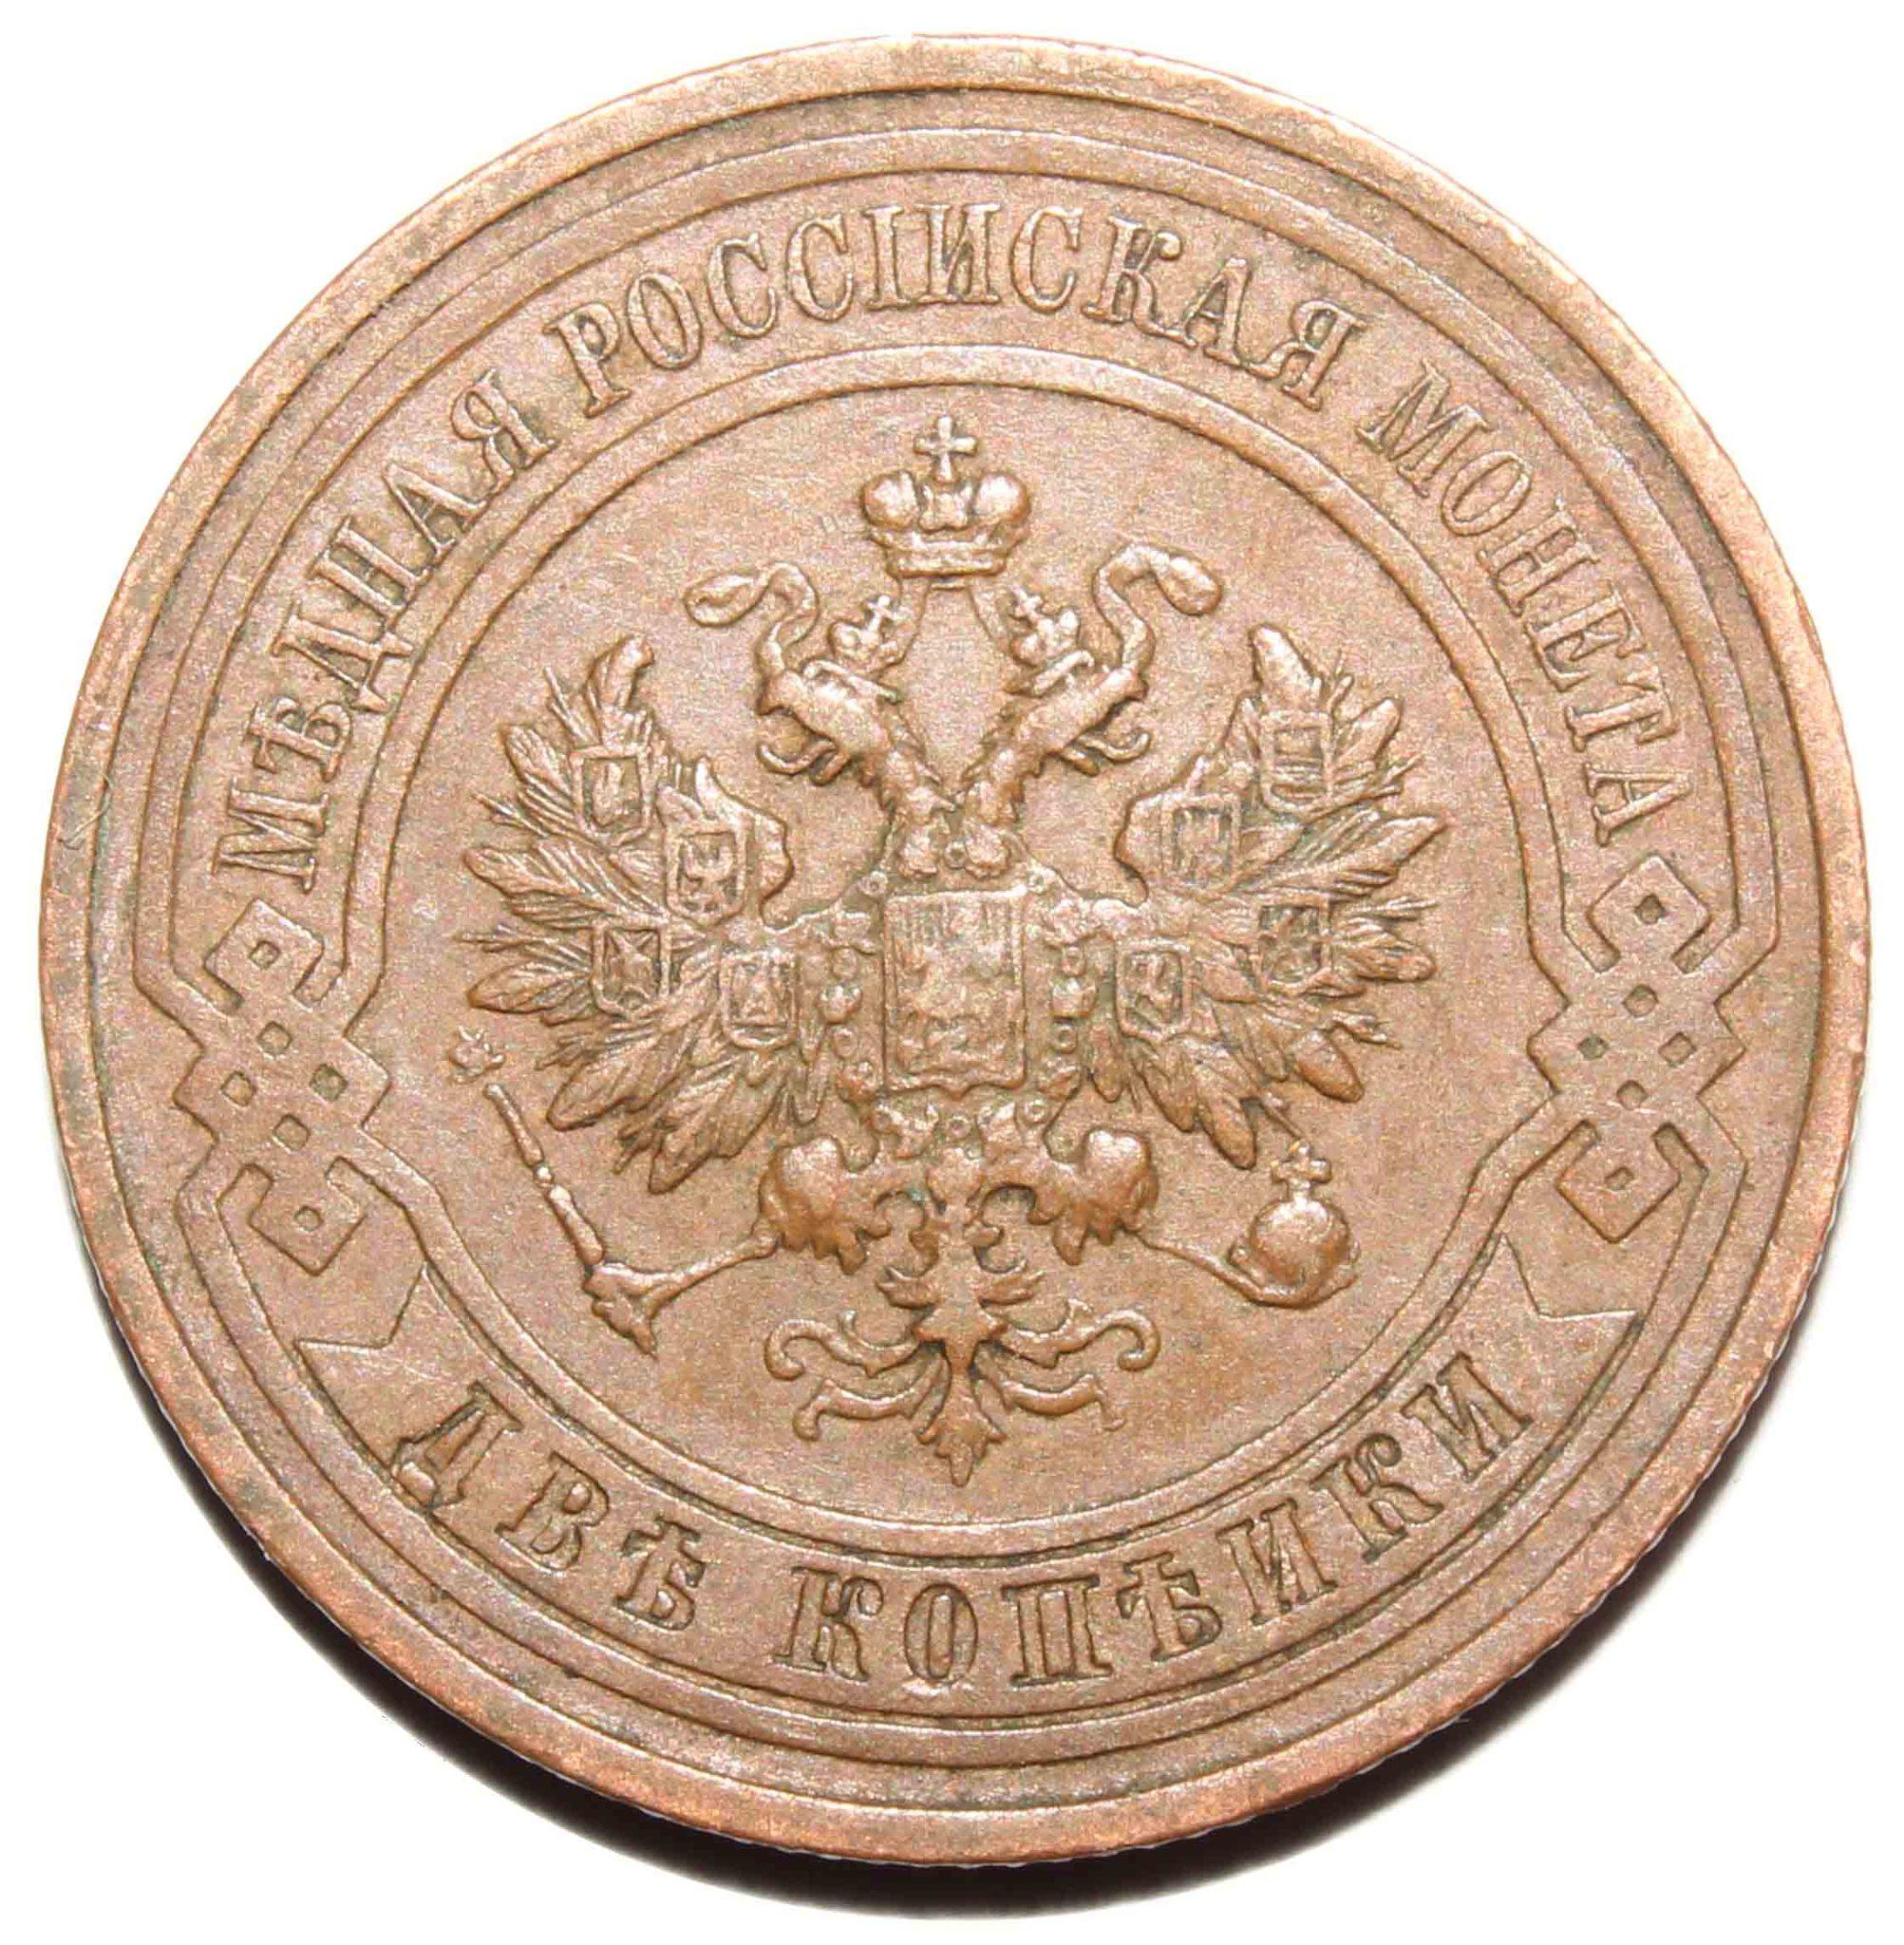 2 копейки. Николай II. СПБ. 1913 год. XF